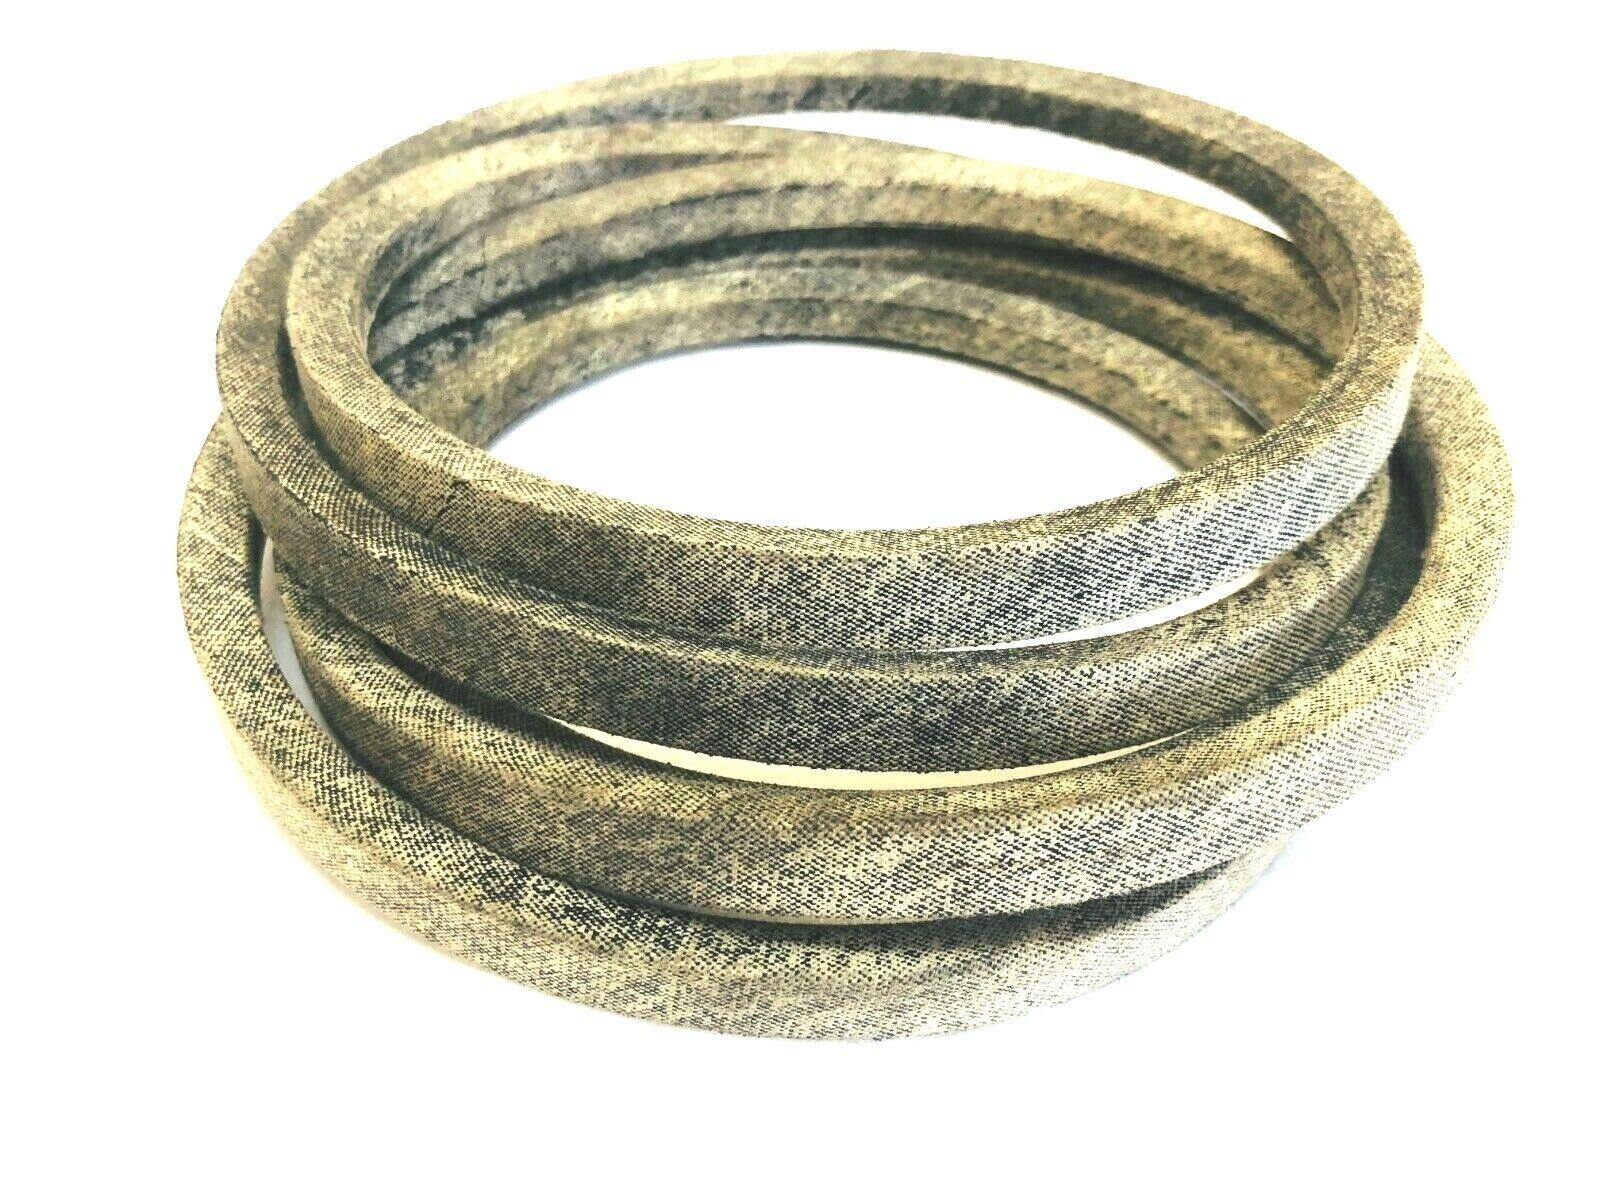 CUB CADET TROY-BILT 9540461 Replacement V-Belt Made With Aramid